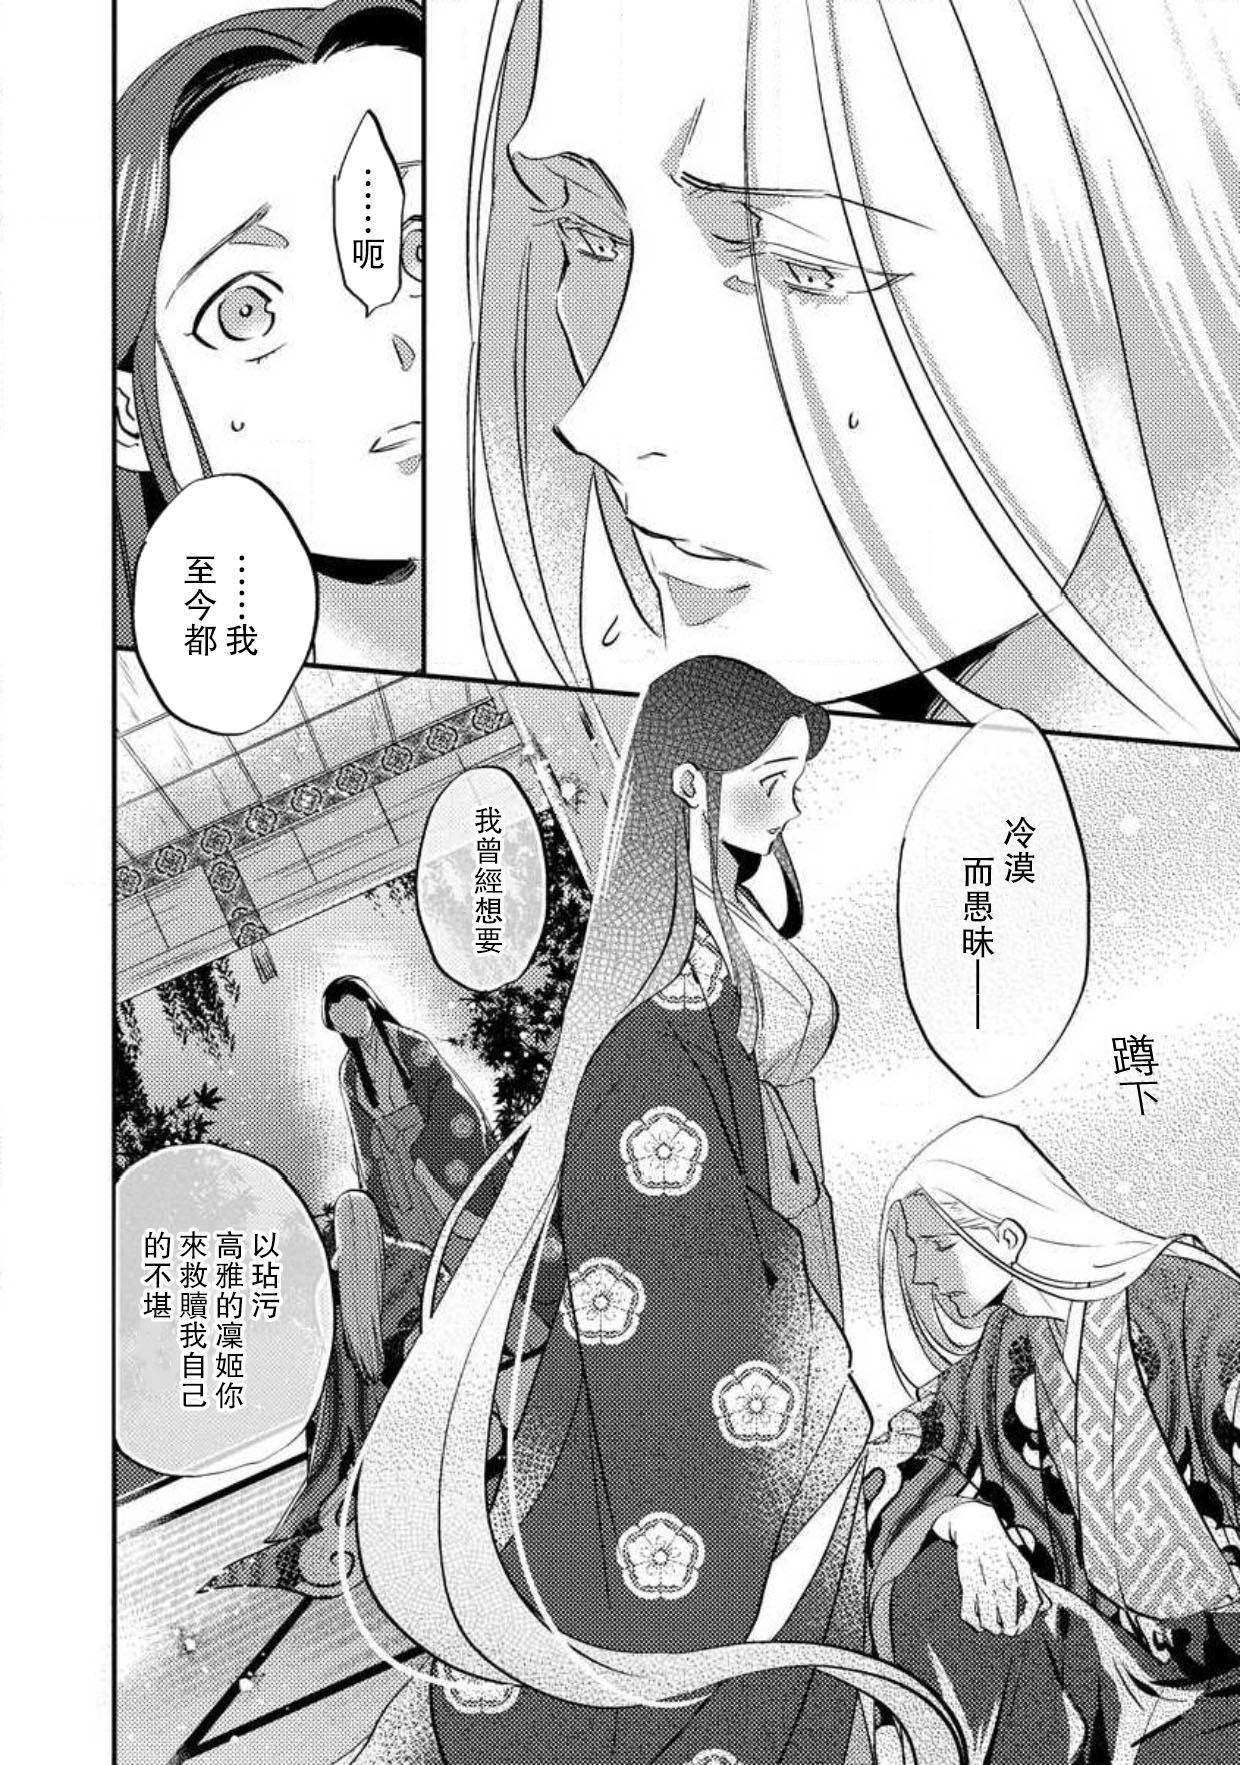 Oeyama suimutan utsukushiki oni no toraware hime | 大江山醉夢逸話 美麗的鬼與被囚禁的公主 Ch. 1-8 171